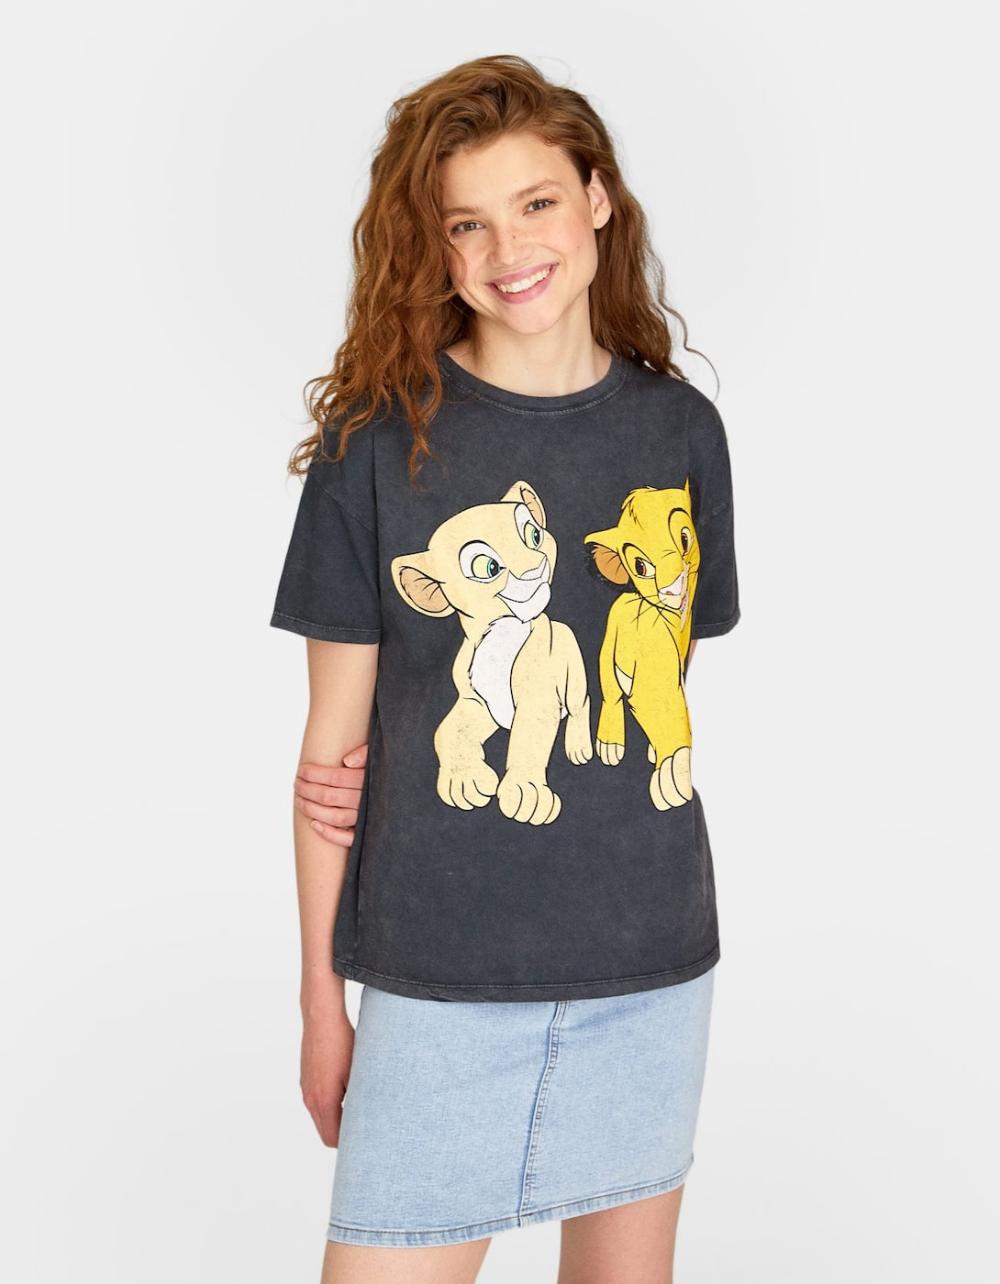 Camiseta Disney Rey Leon Null De Mujer Stradivarius T Shirts For Women Women Womens Shirts [ 1284 x 1000 Pixel ]